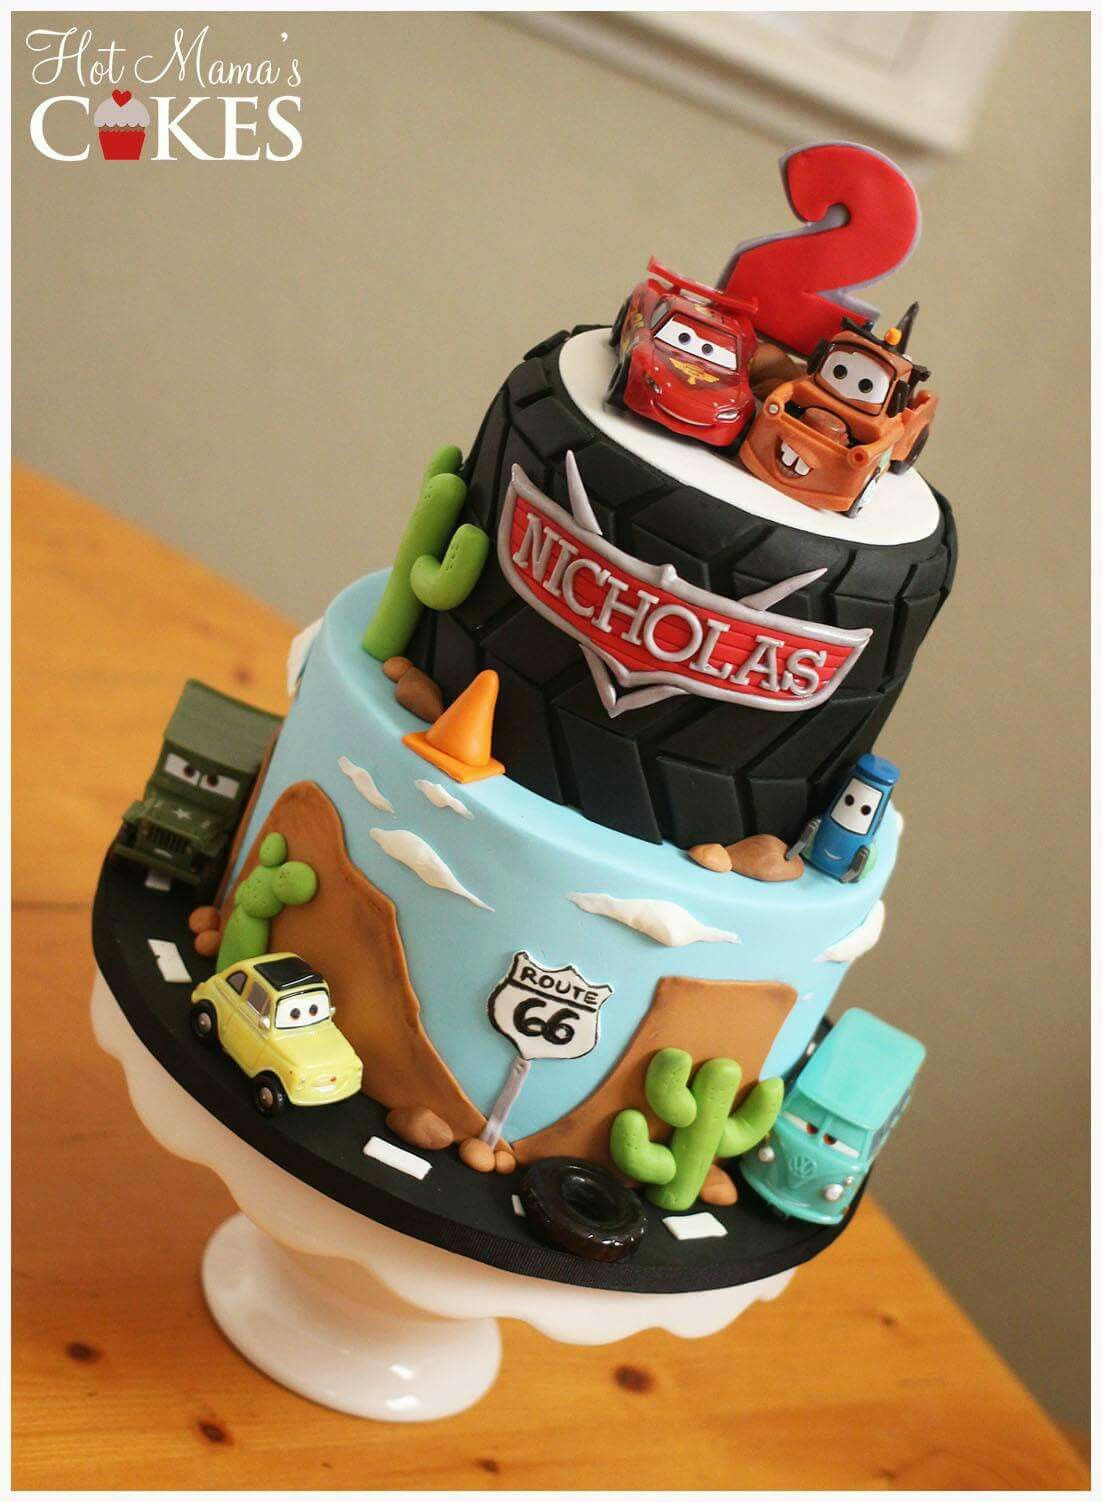 Pixar cars cake Cakes Pinterest Car cakes Cars and Cake